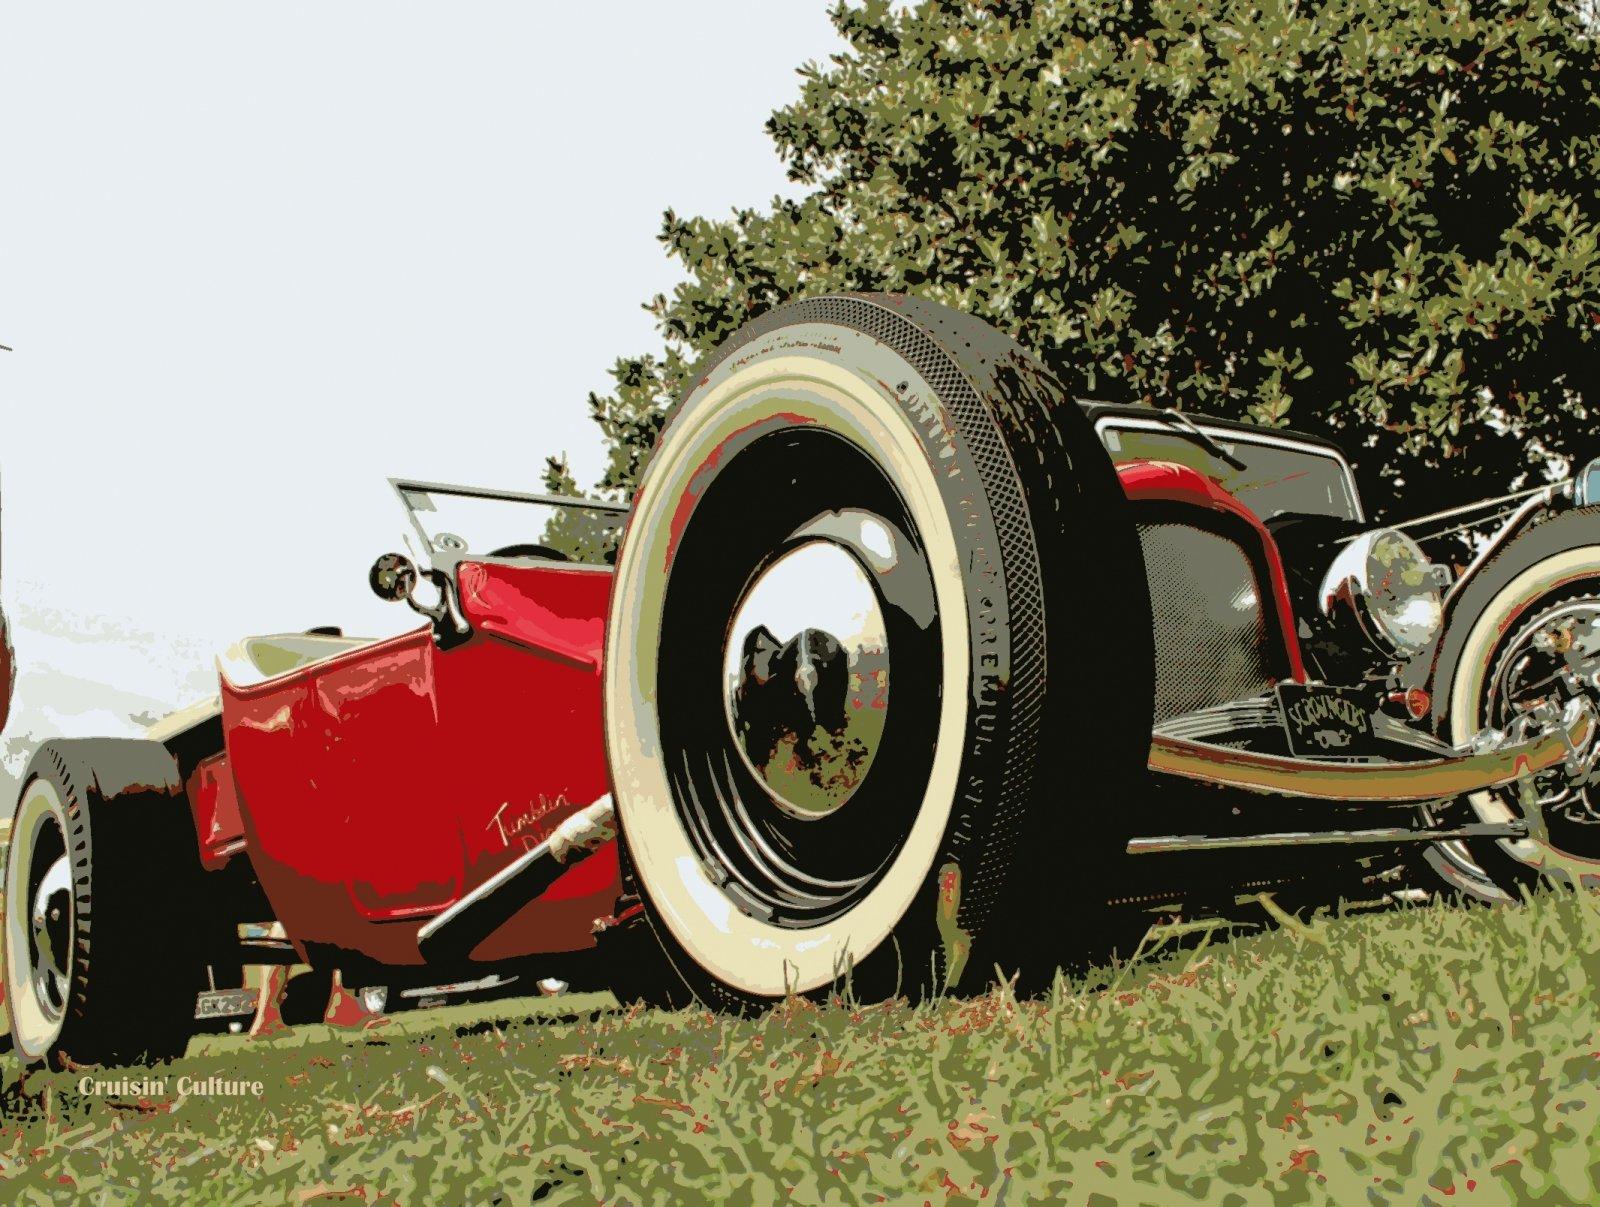 IMG_4552polorton50ccpostercropbrtcc.jpg